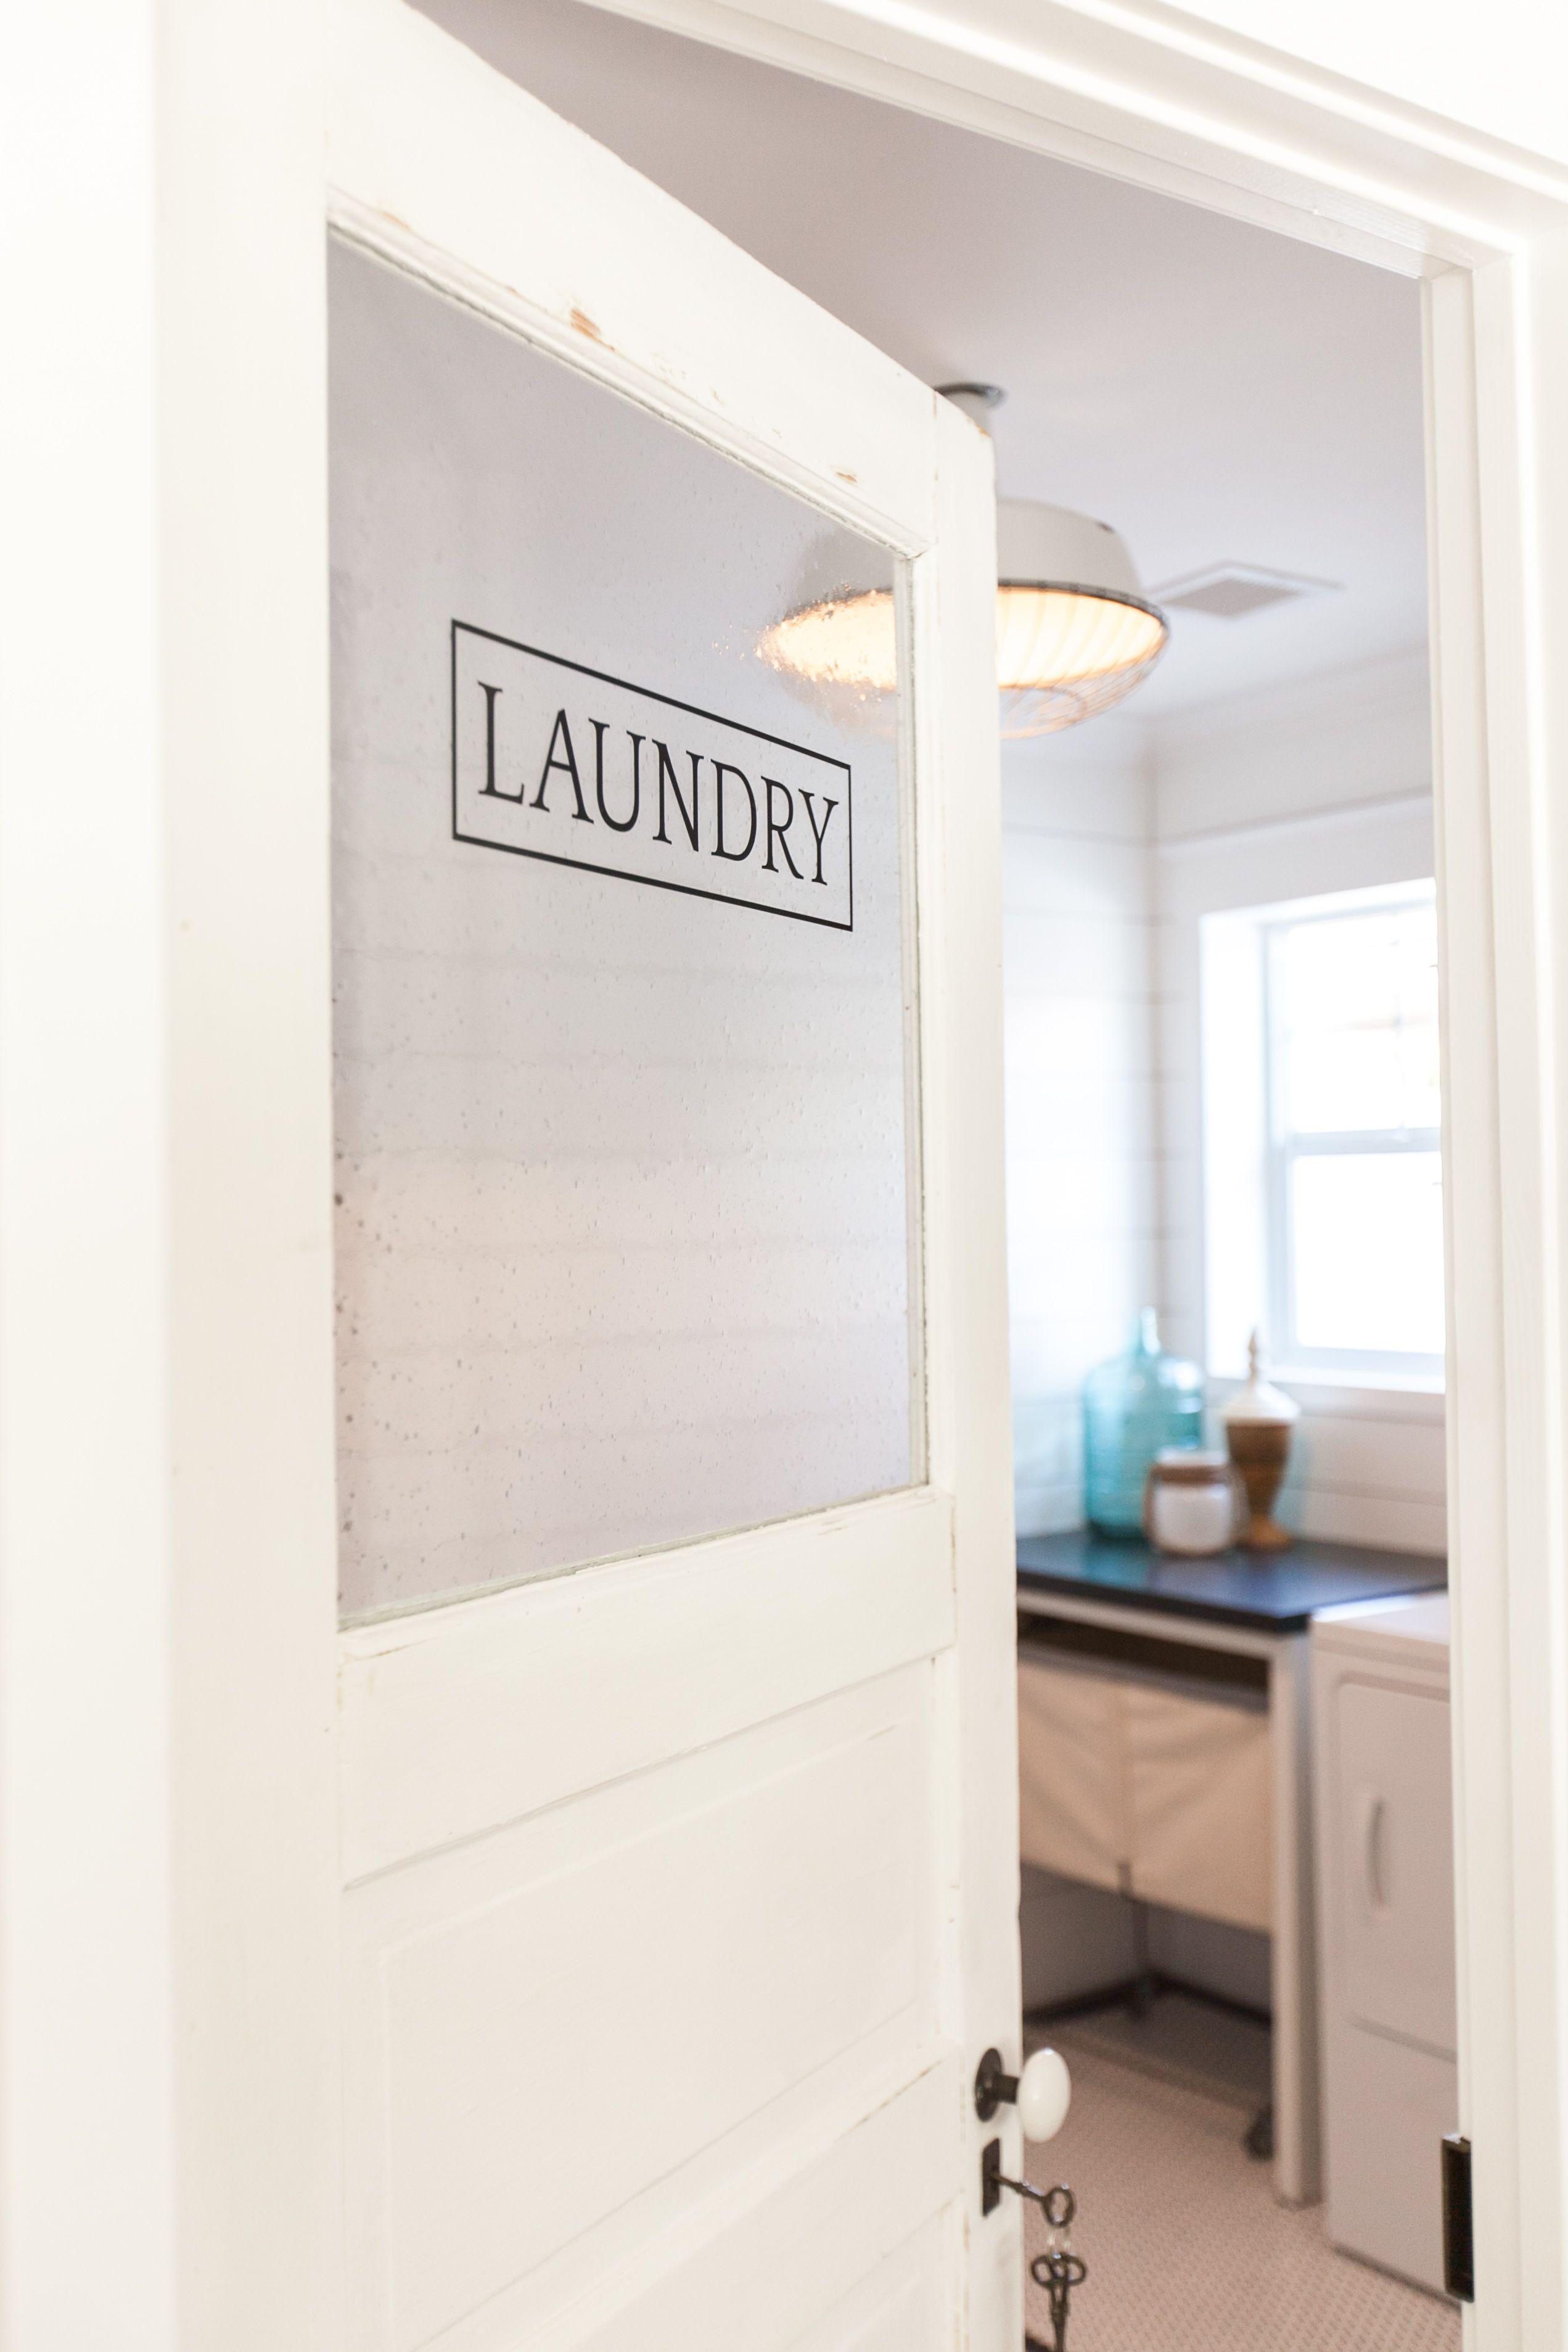 Vintage Door Repurposed As Laundry Room Door As Featured On Rafterhouse Pilot Show On Hgtv Laundry Room Doors Laundry Doors Vintage Doors Repurposed